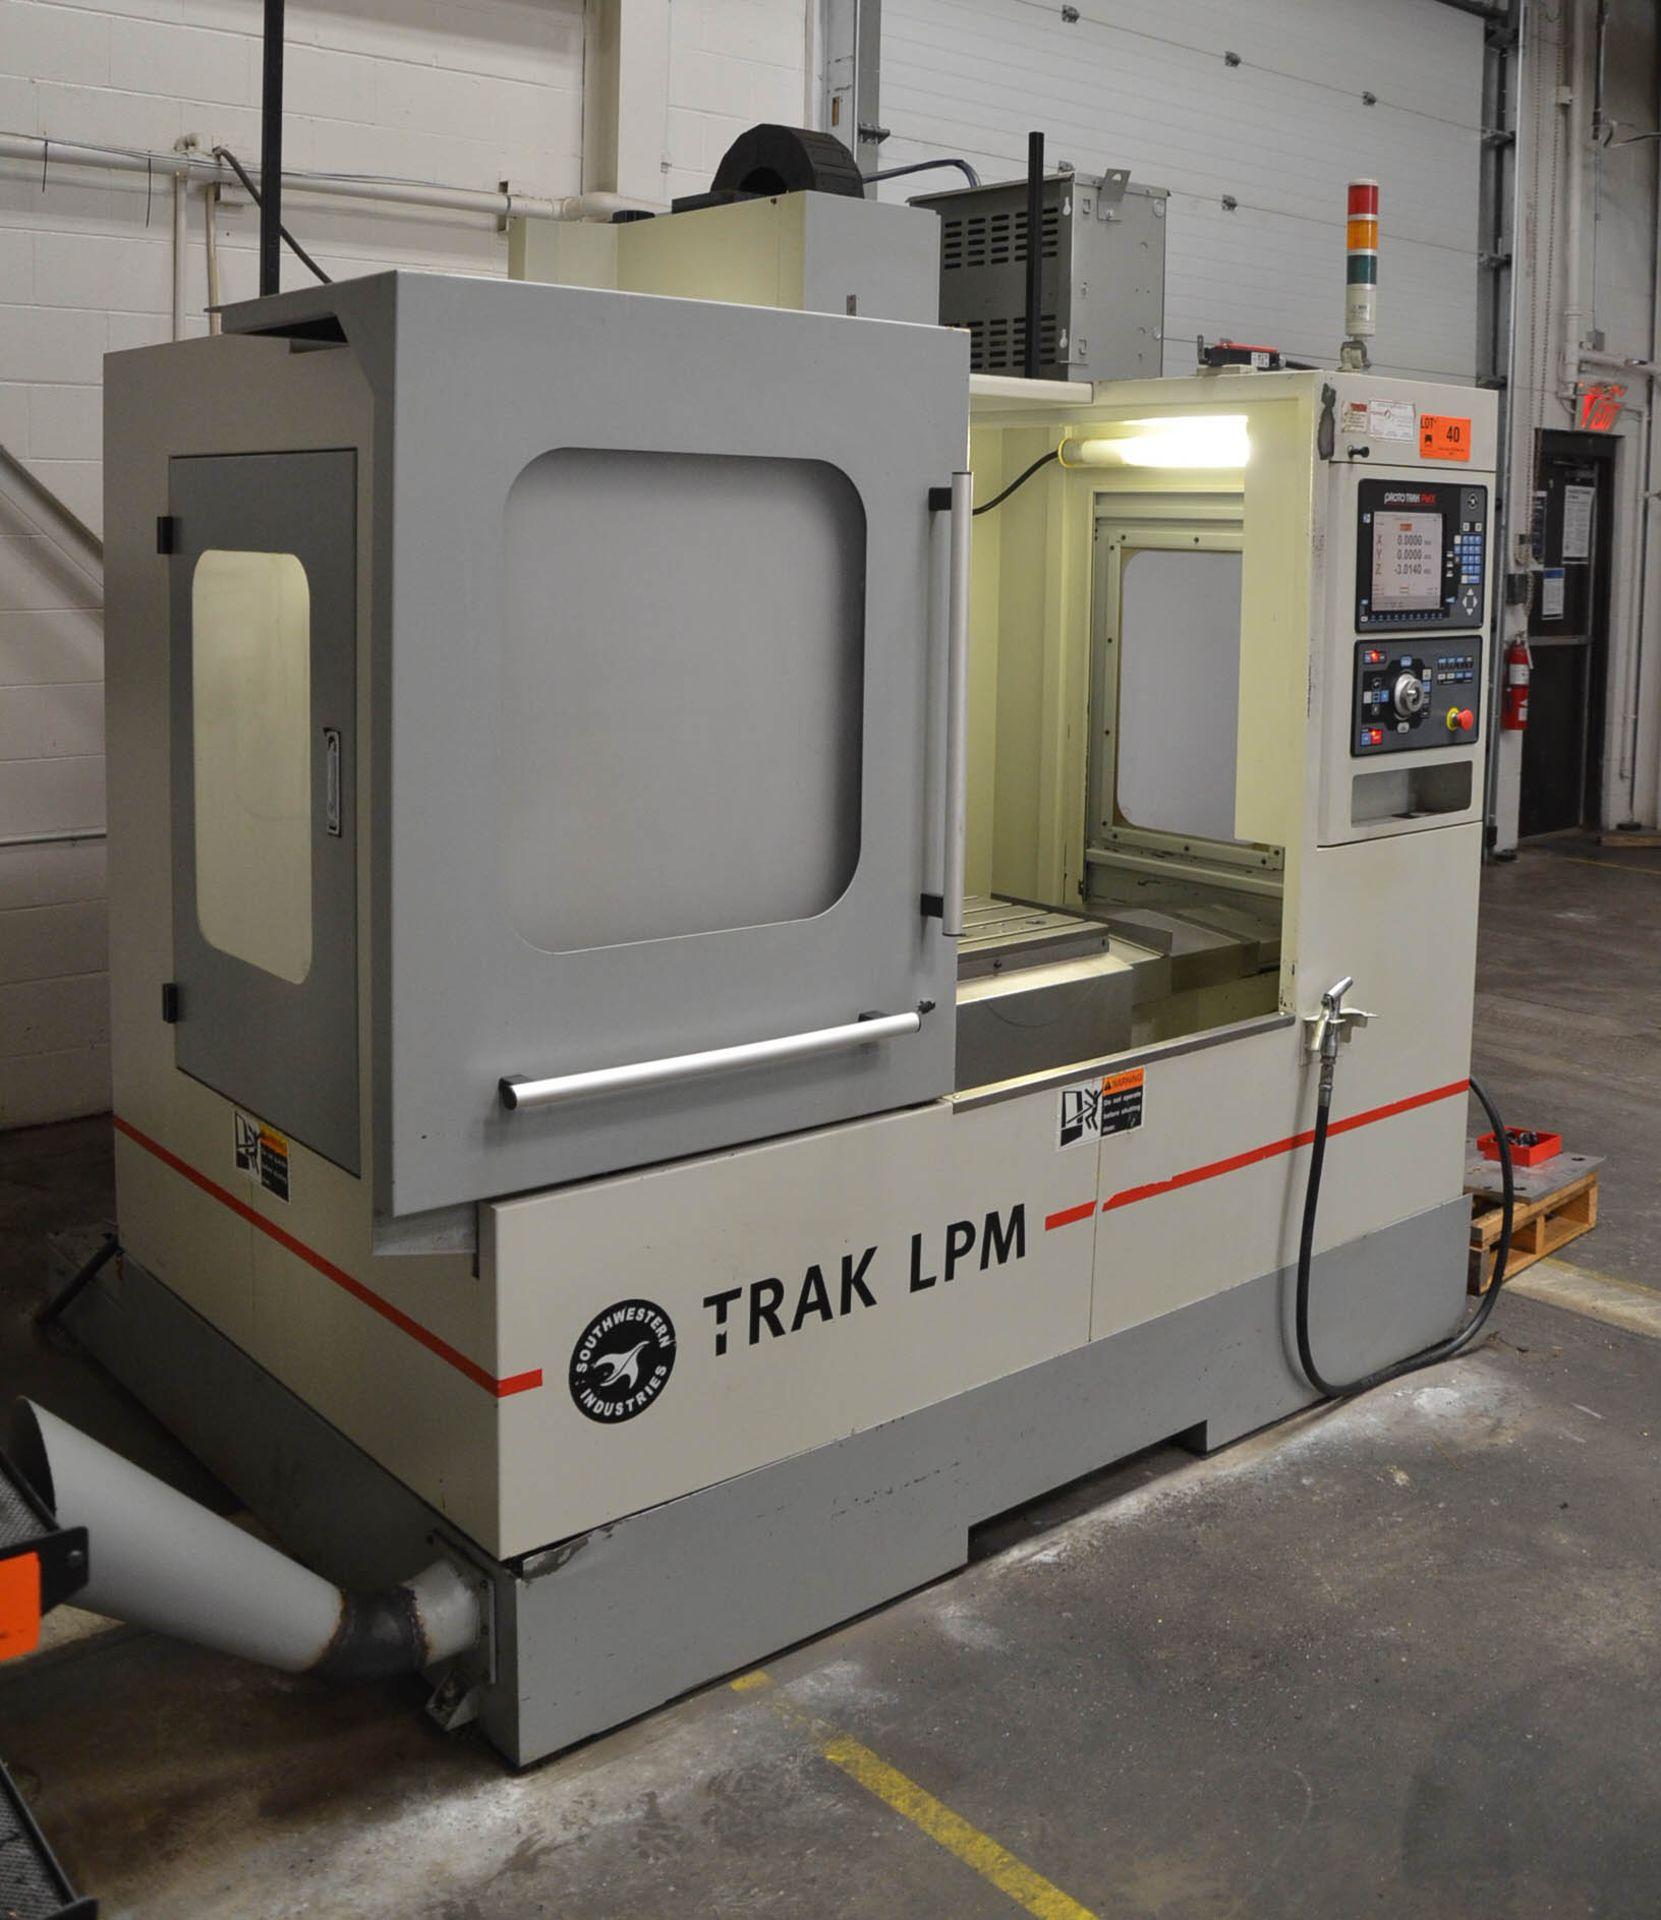 "SWI (2013) TRAK LPM CNC VERTICAL MACHINING CENTER WITH PROTO TRAK PMX CNC CONTROL, 19.5"" X 35.5"" - Image 3 of 9"